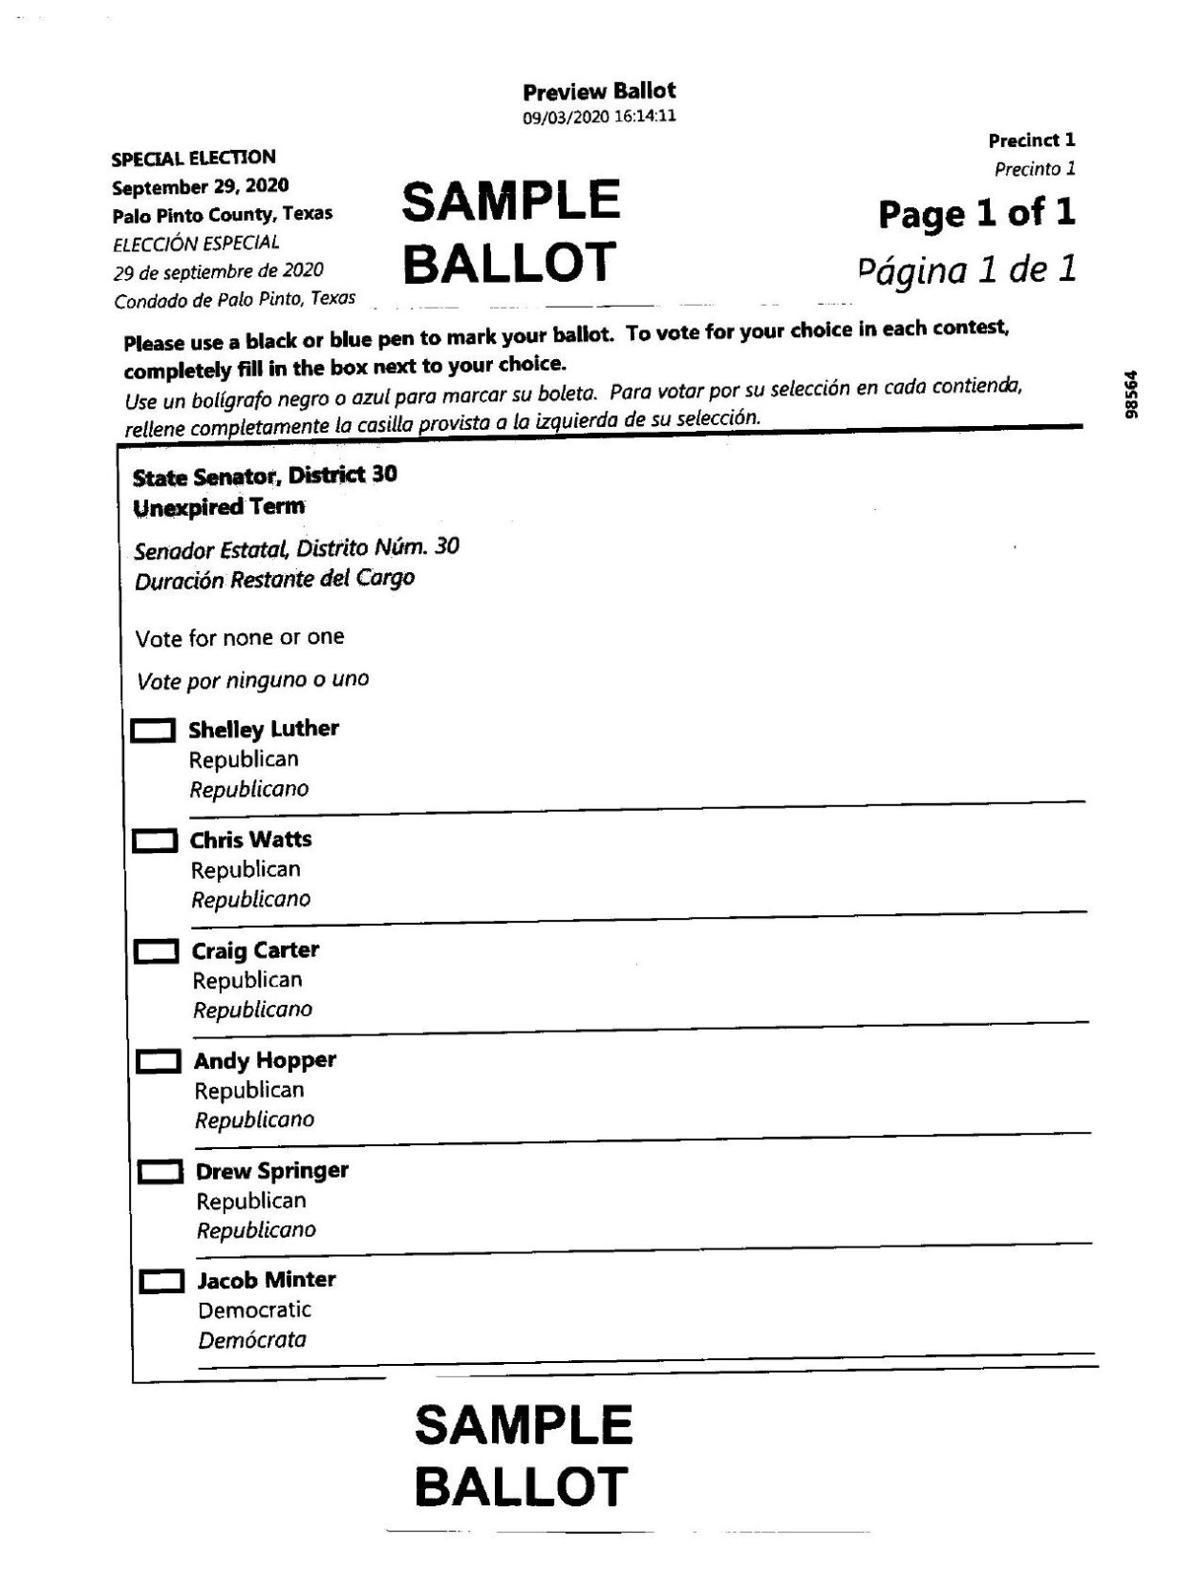 PDF: Palo Pinto County sample ballot